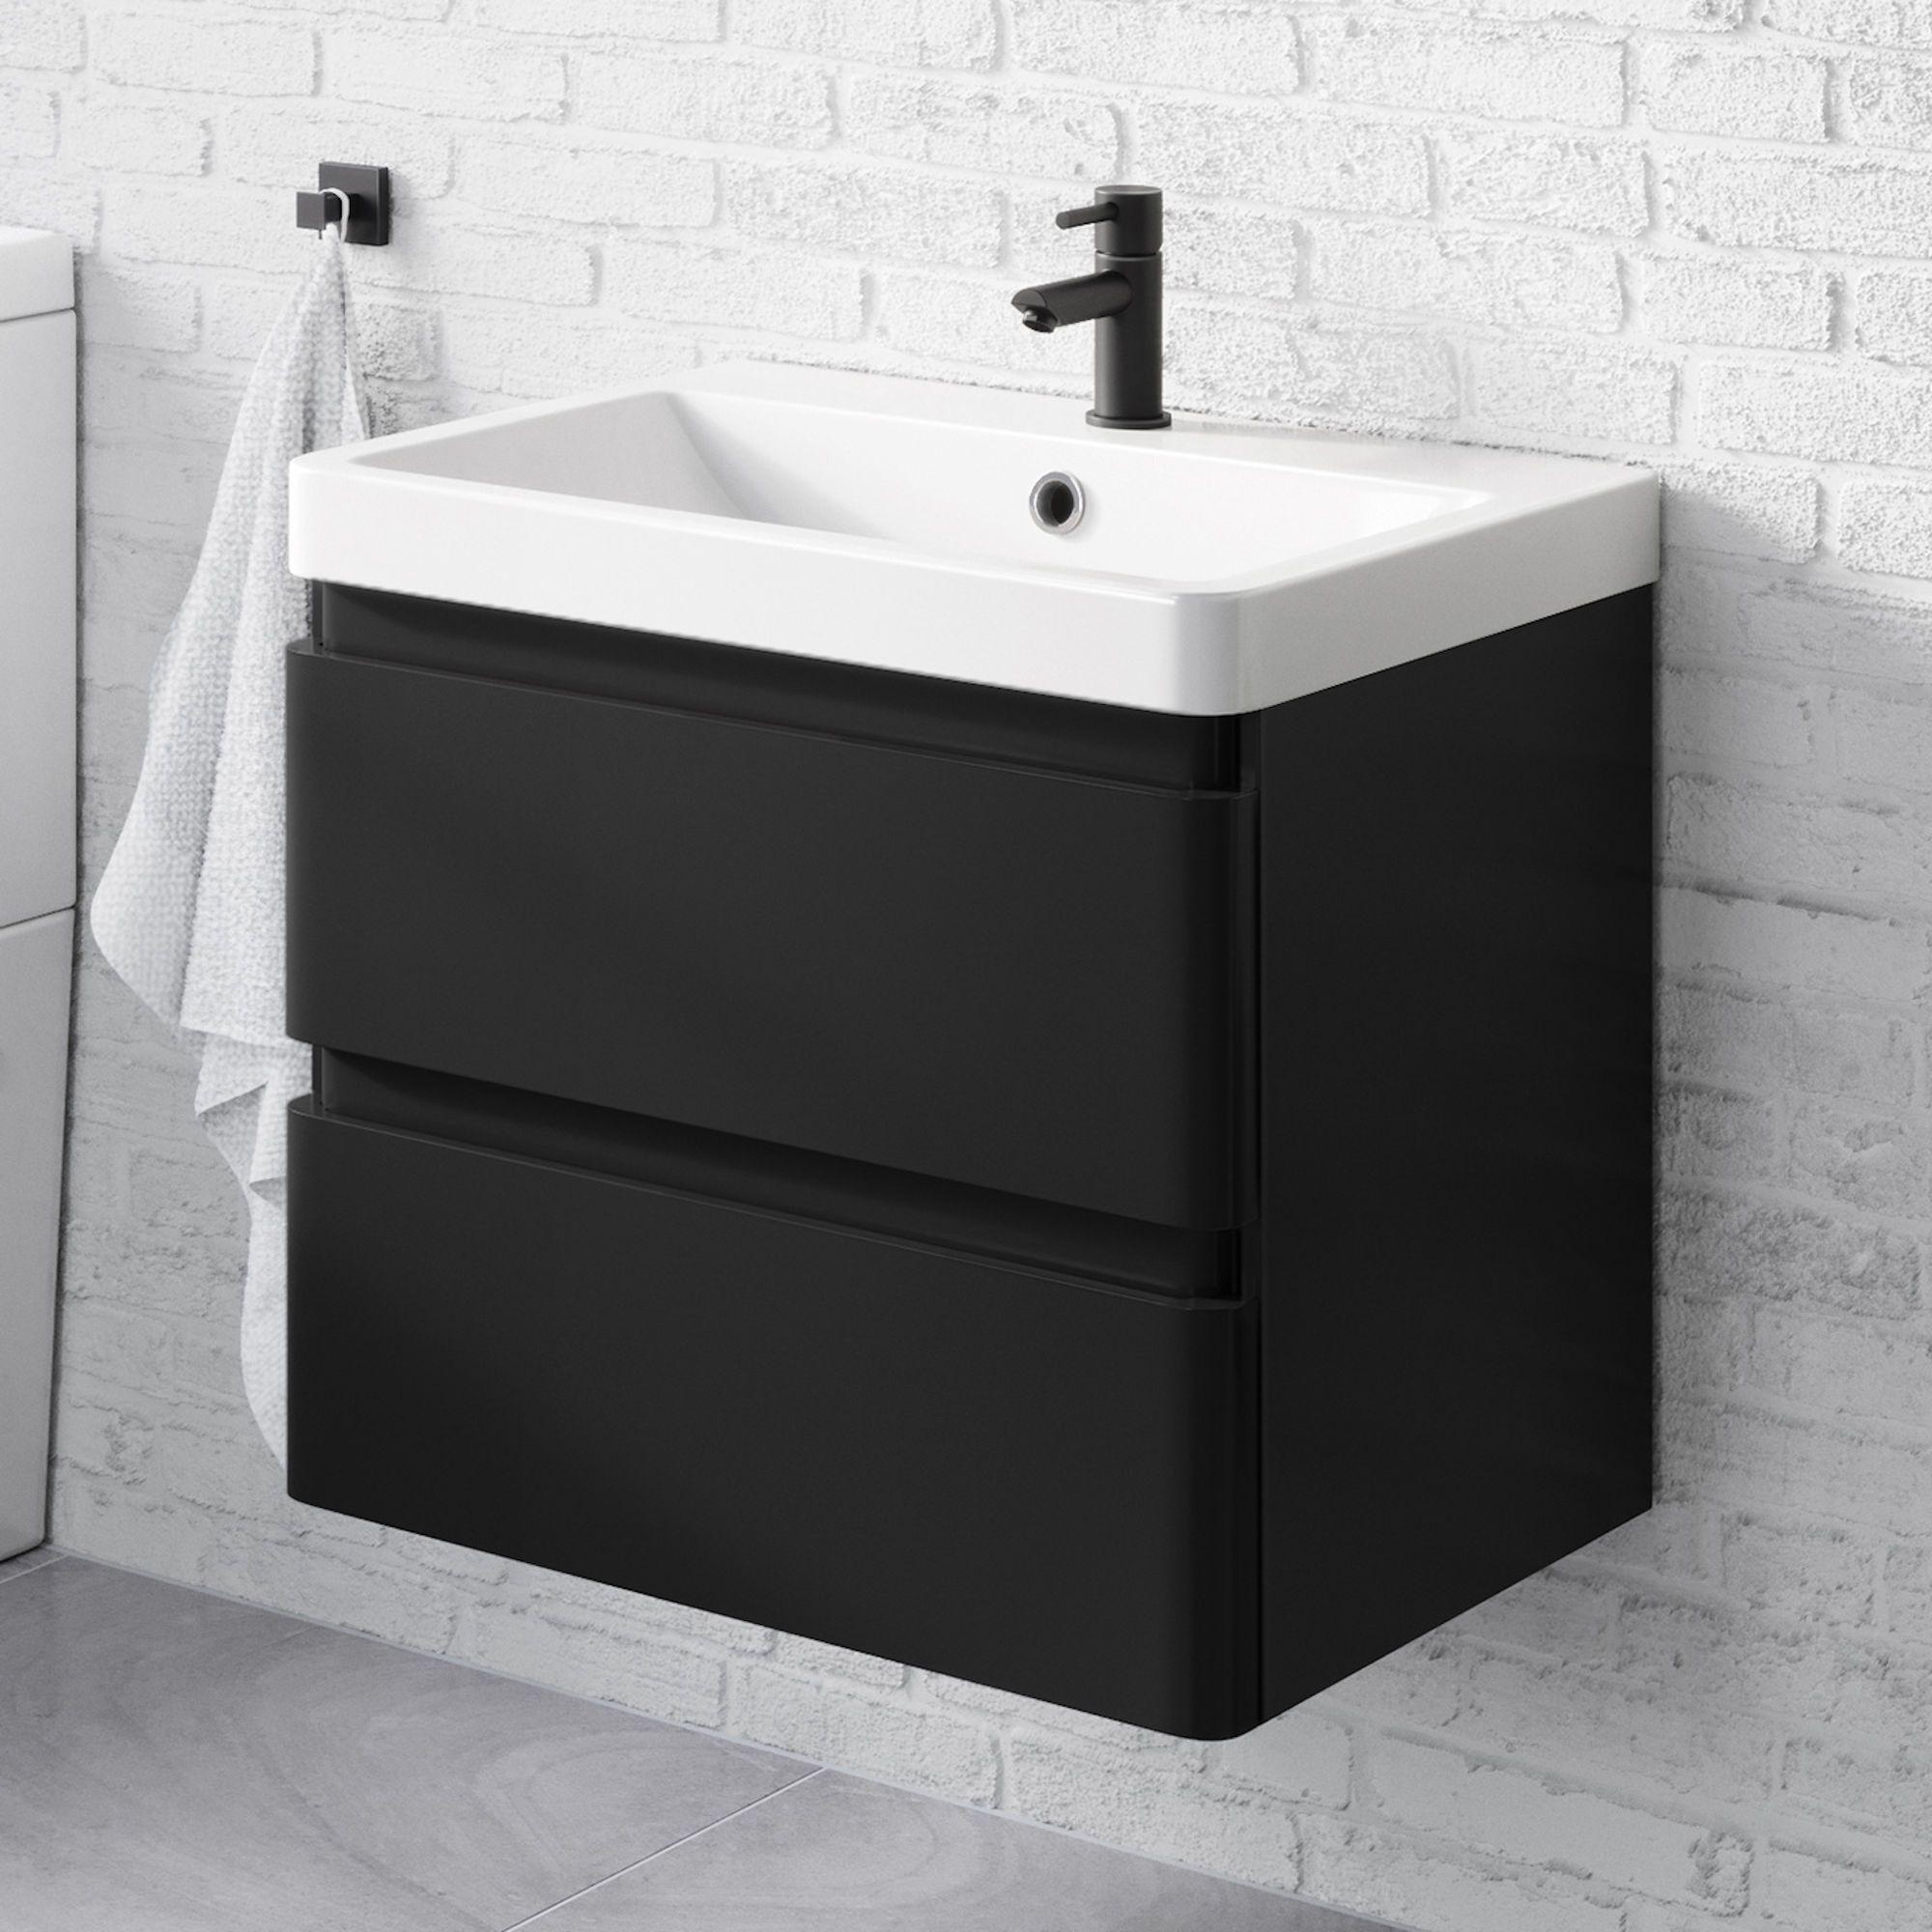 600mm Denver Ii Matte Black Built In Basin Drawer Unit Wall Hung Black Vanity Bathroom Black Bathroom Sink Black Bathroom